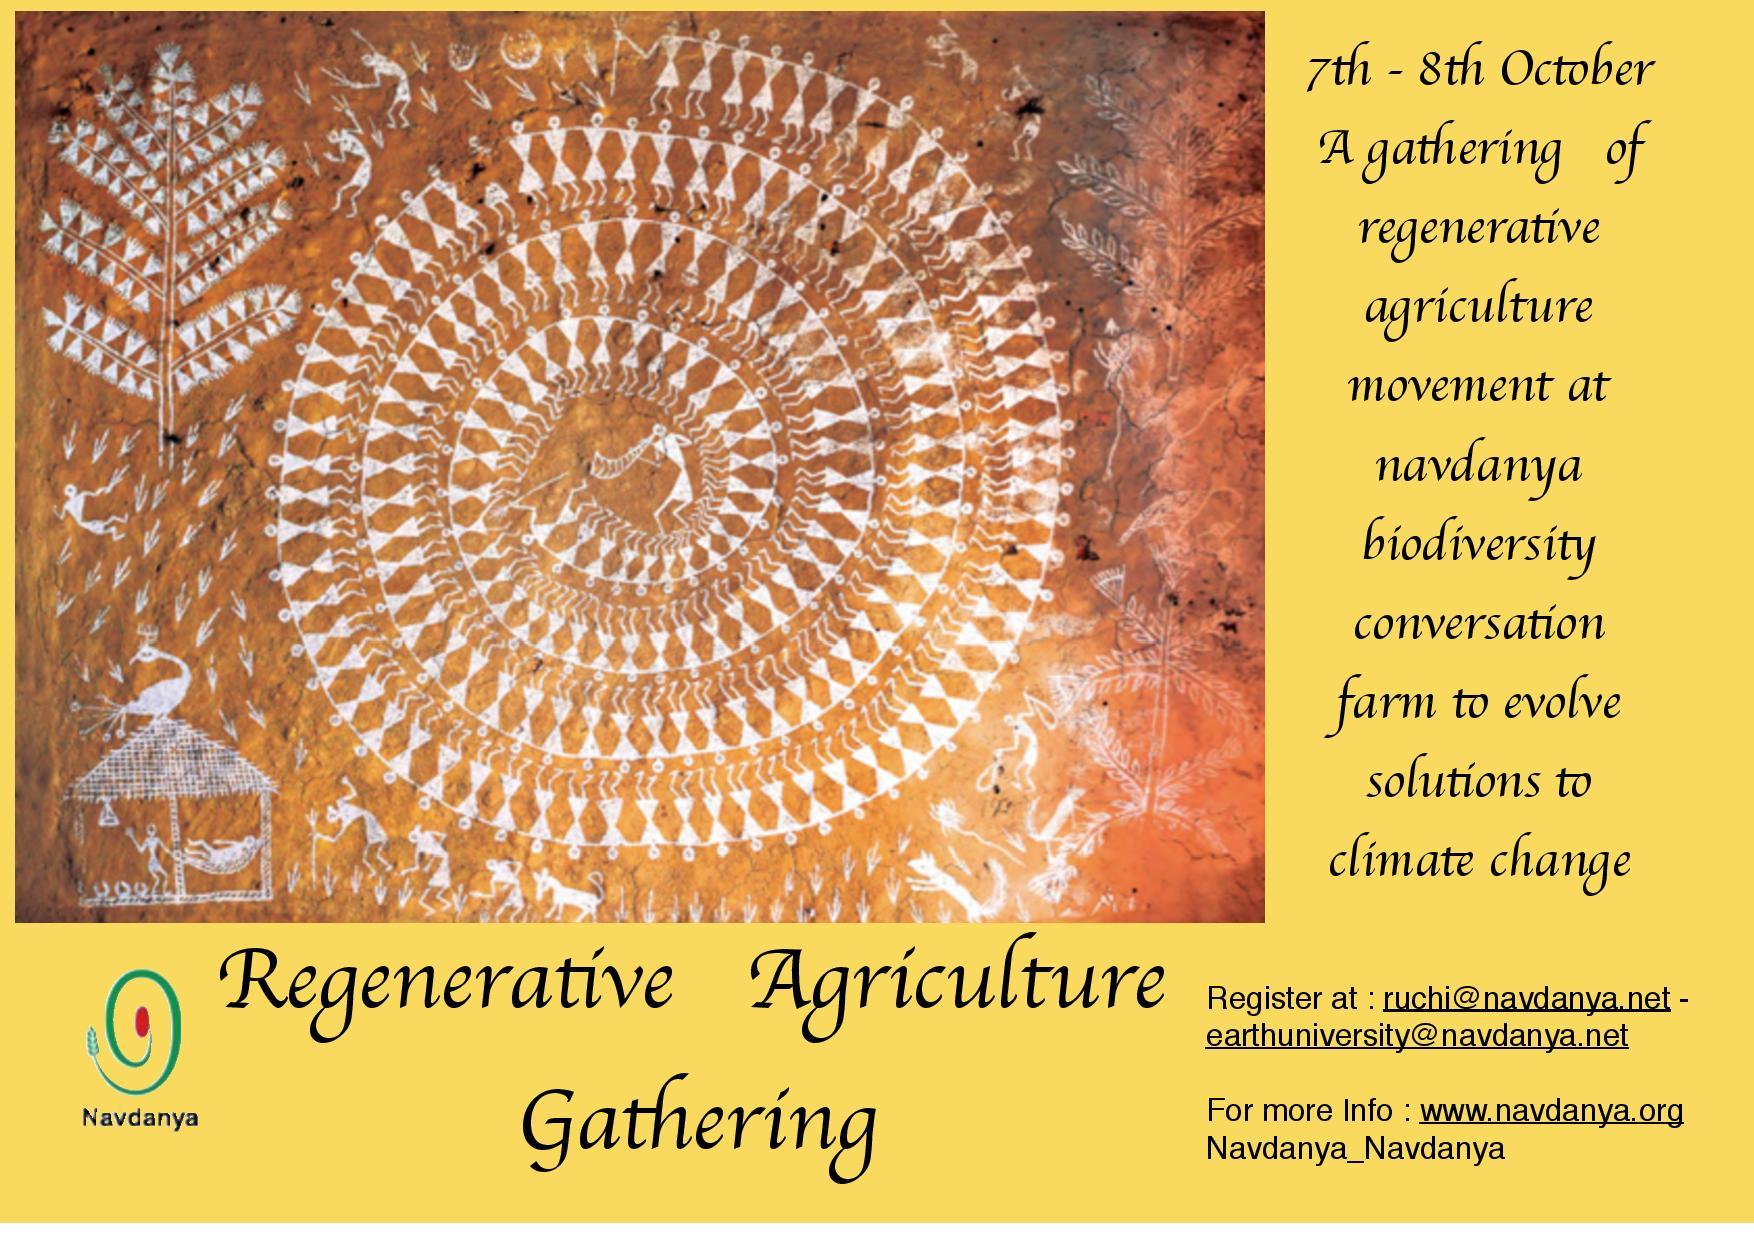 Regenerative Agriculture Gathering